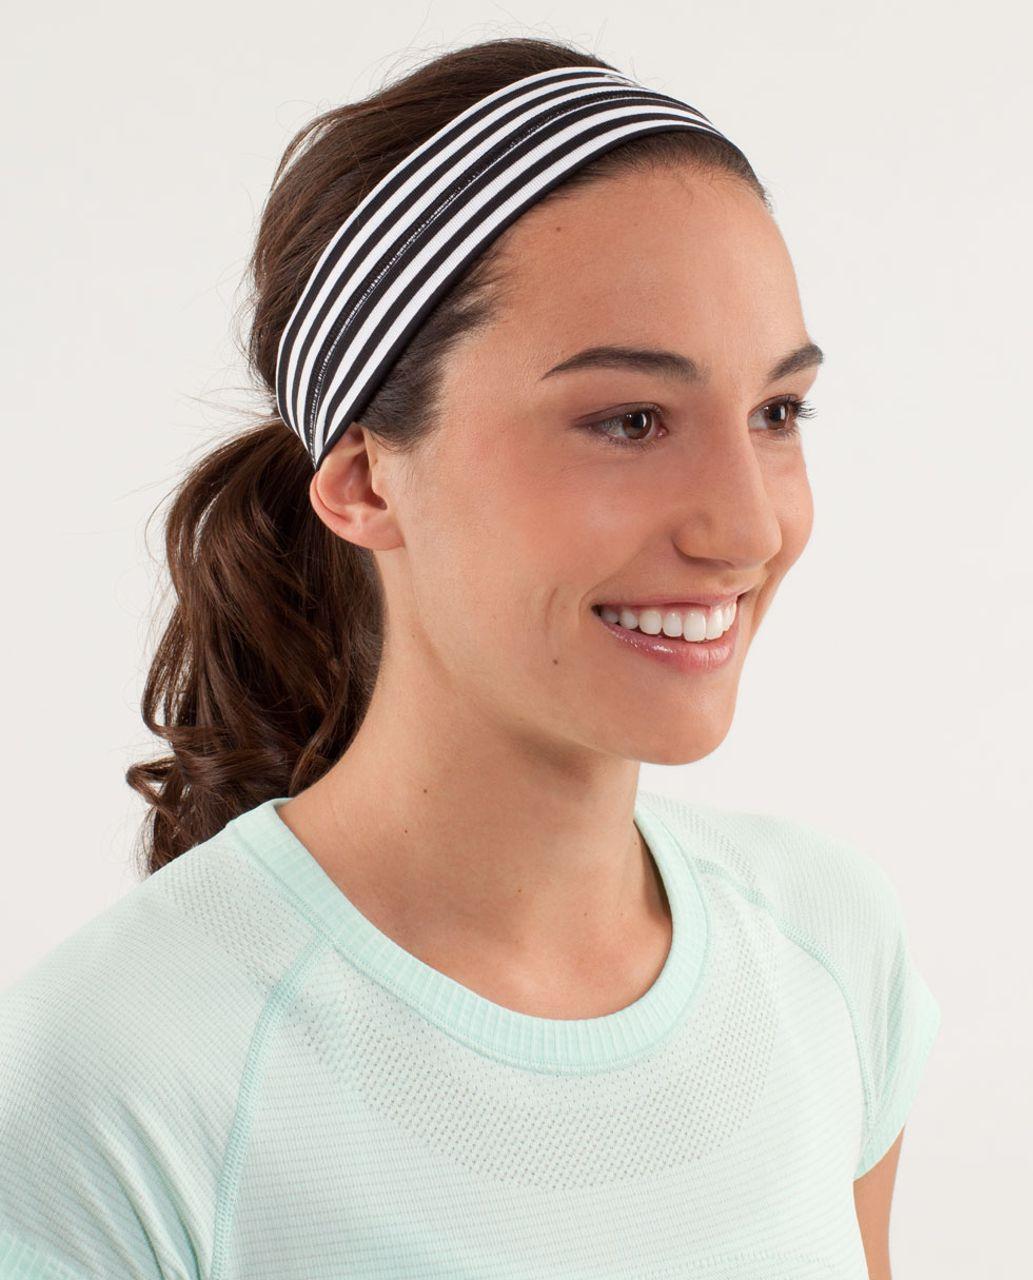 Lululemon Fly Away Tamer Headband - Classic Stripe Black And White